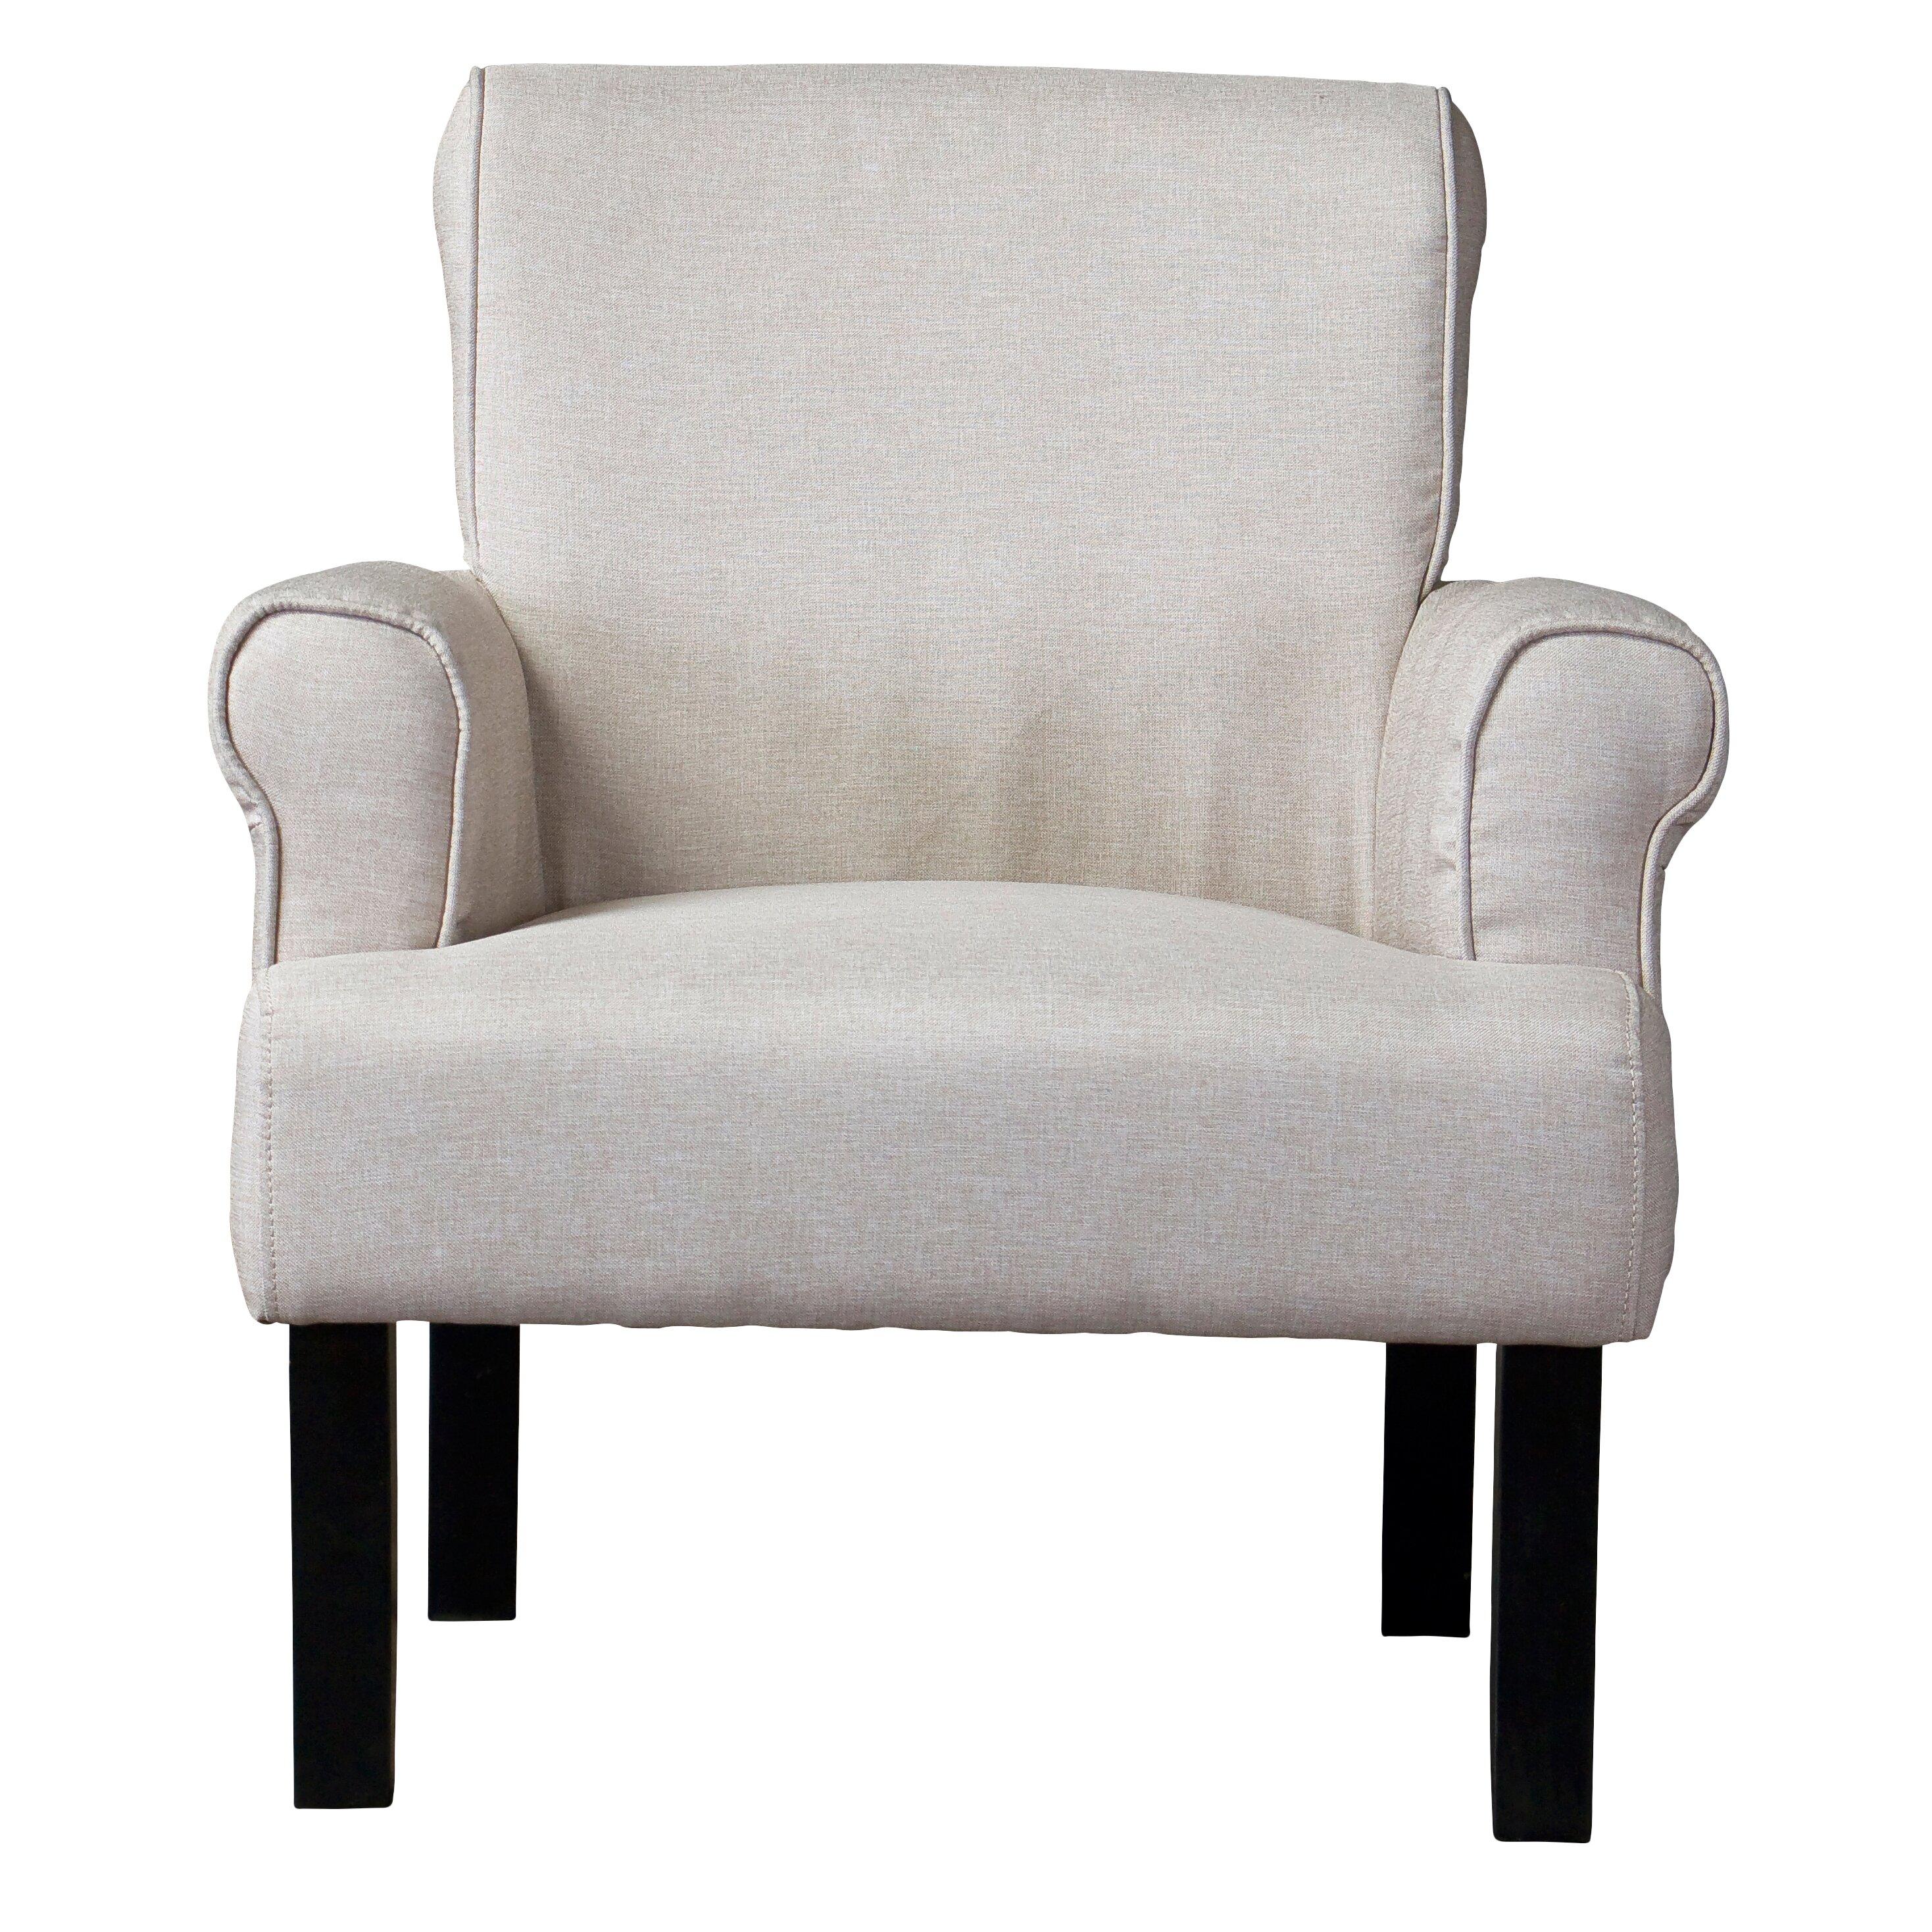 wholesale interiors baxton studio classics wing arm chair